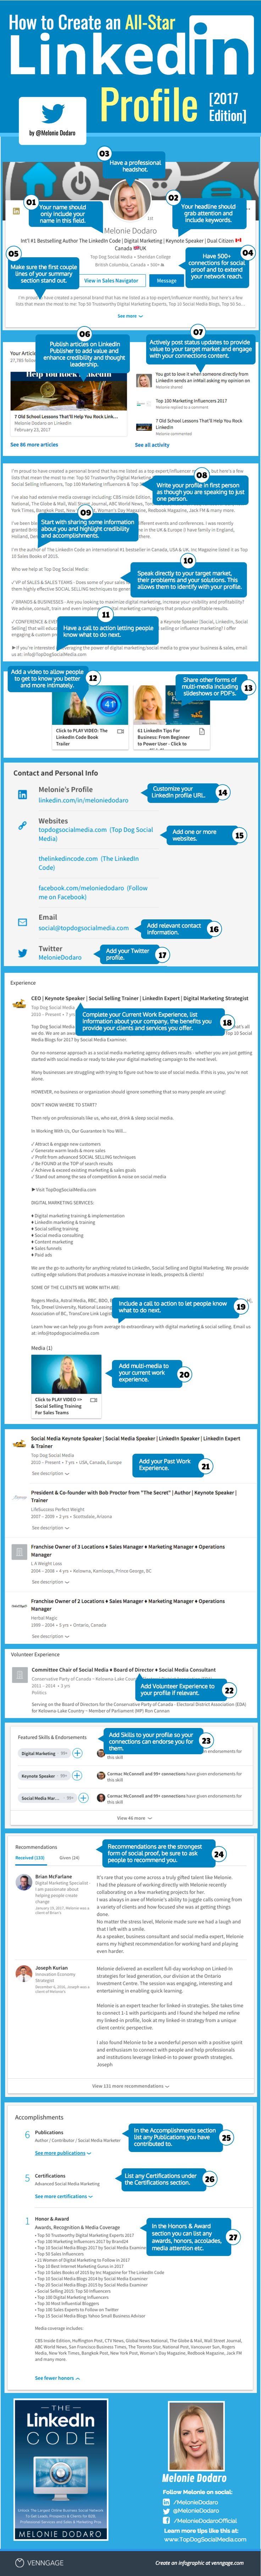 How to Create an All-Star LinkedIn Profile [INFOGRAPHIC] https://siaseo.com/certificados-de-seguridad-ssl/